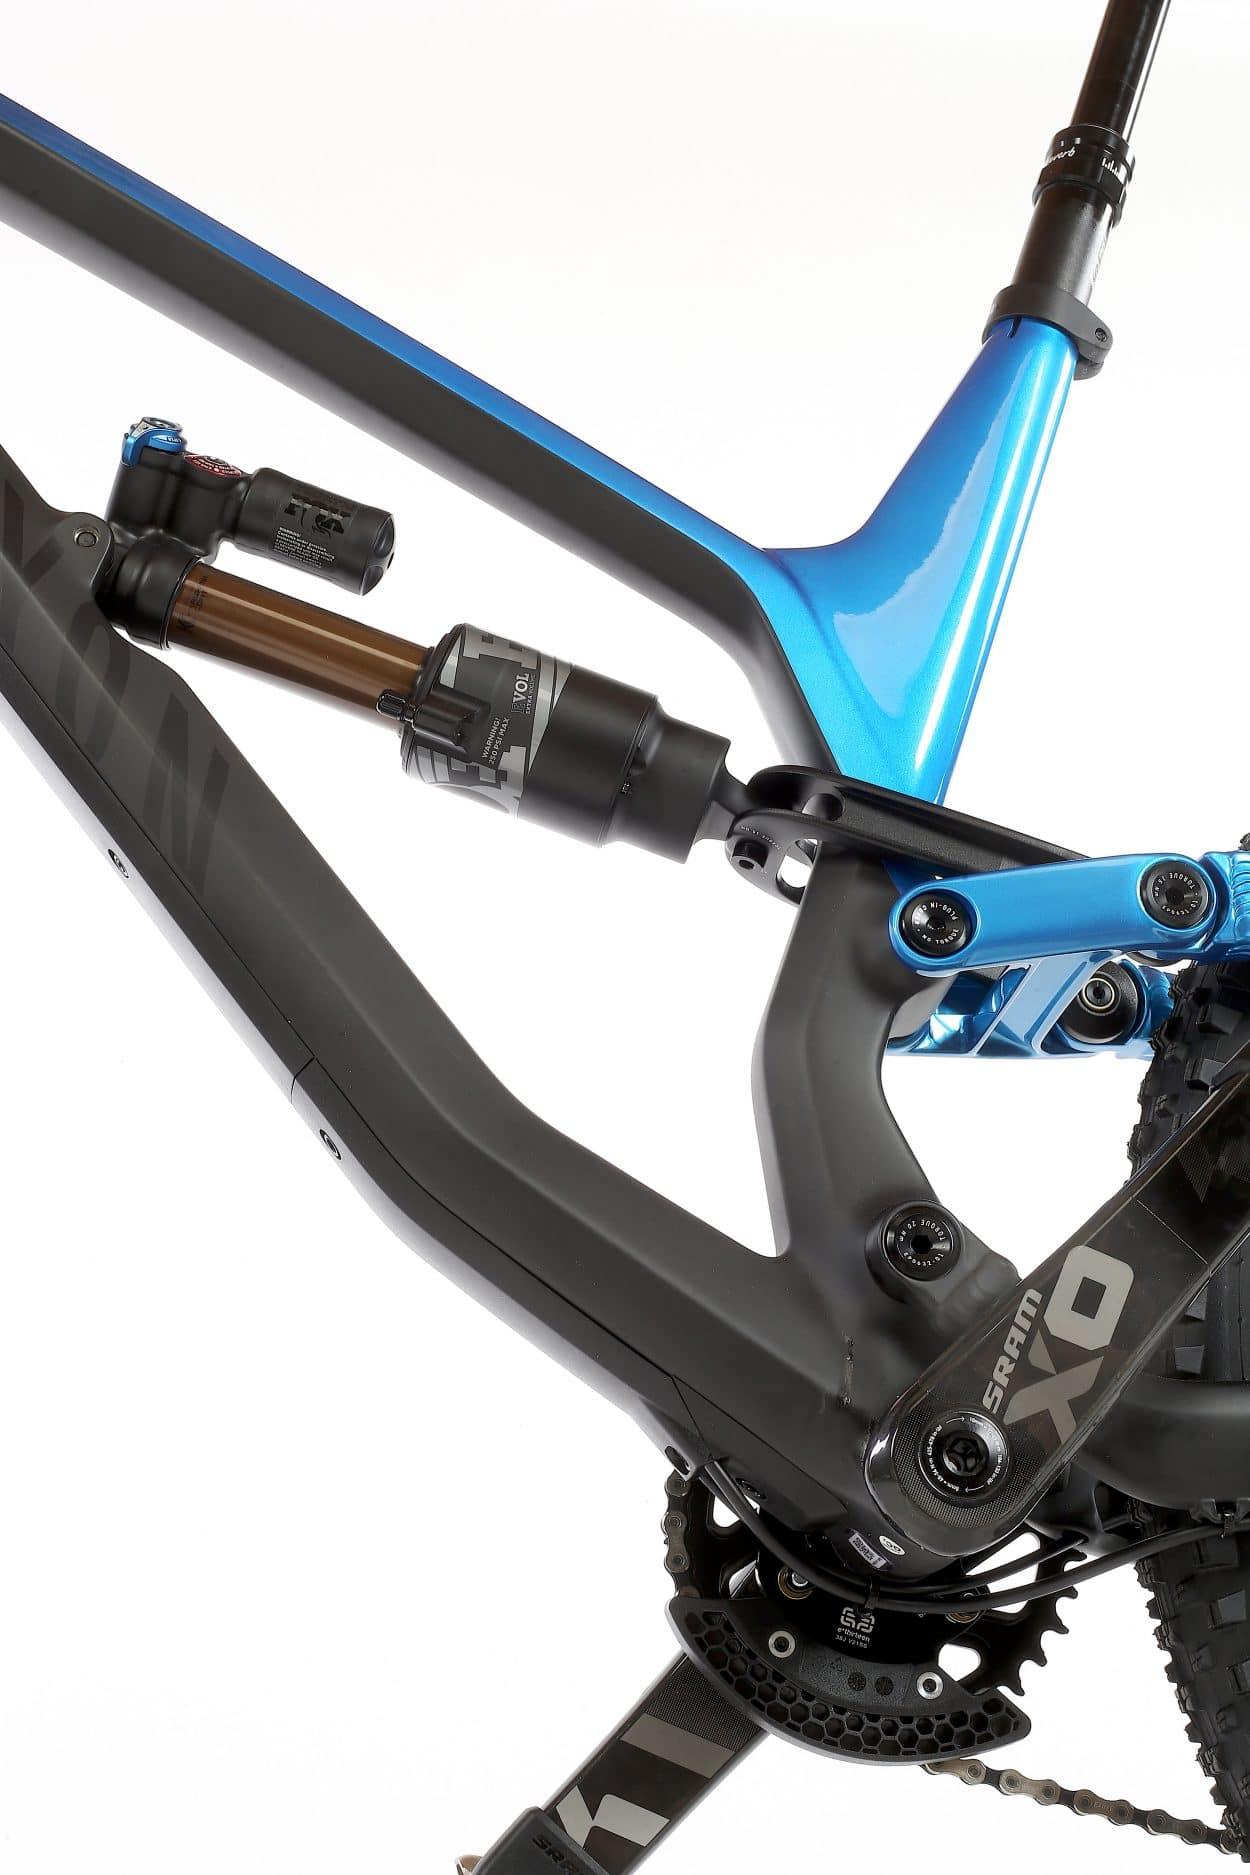 Bike Test: Canyon Torque CF 9 0 PRO | Mountain Bike Action